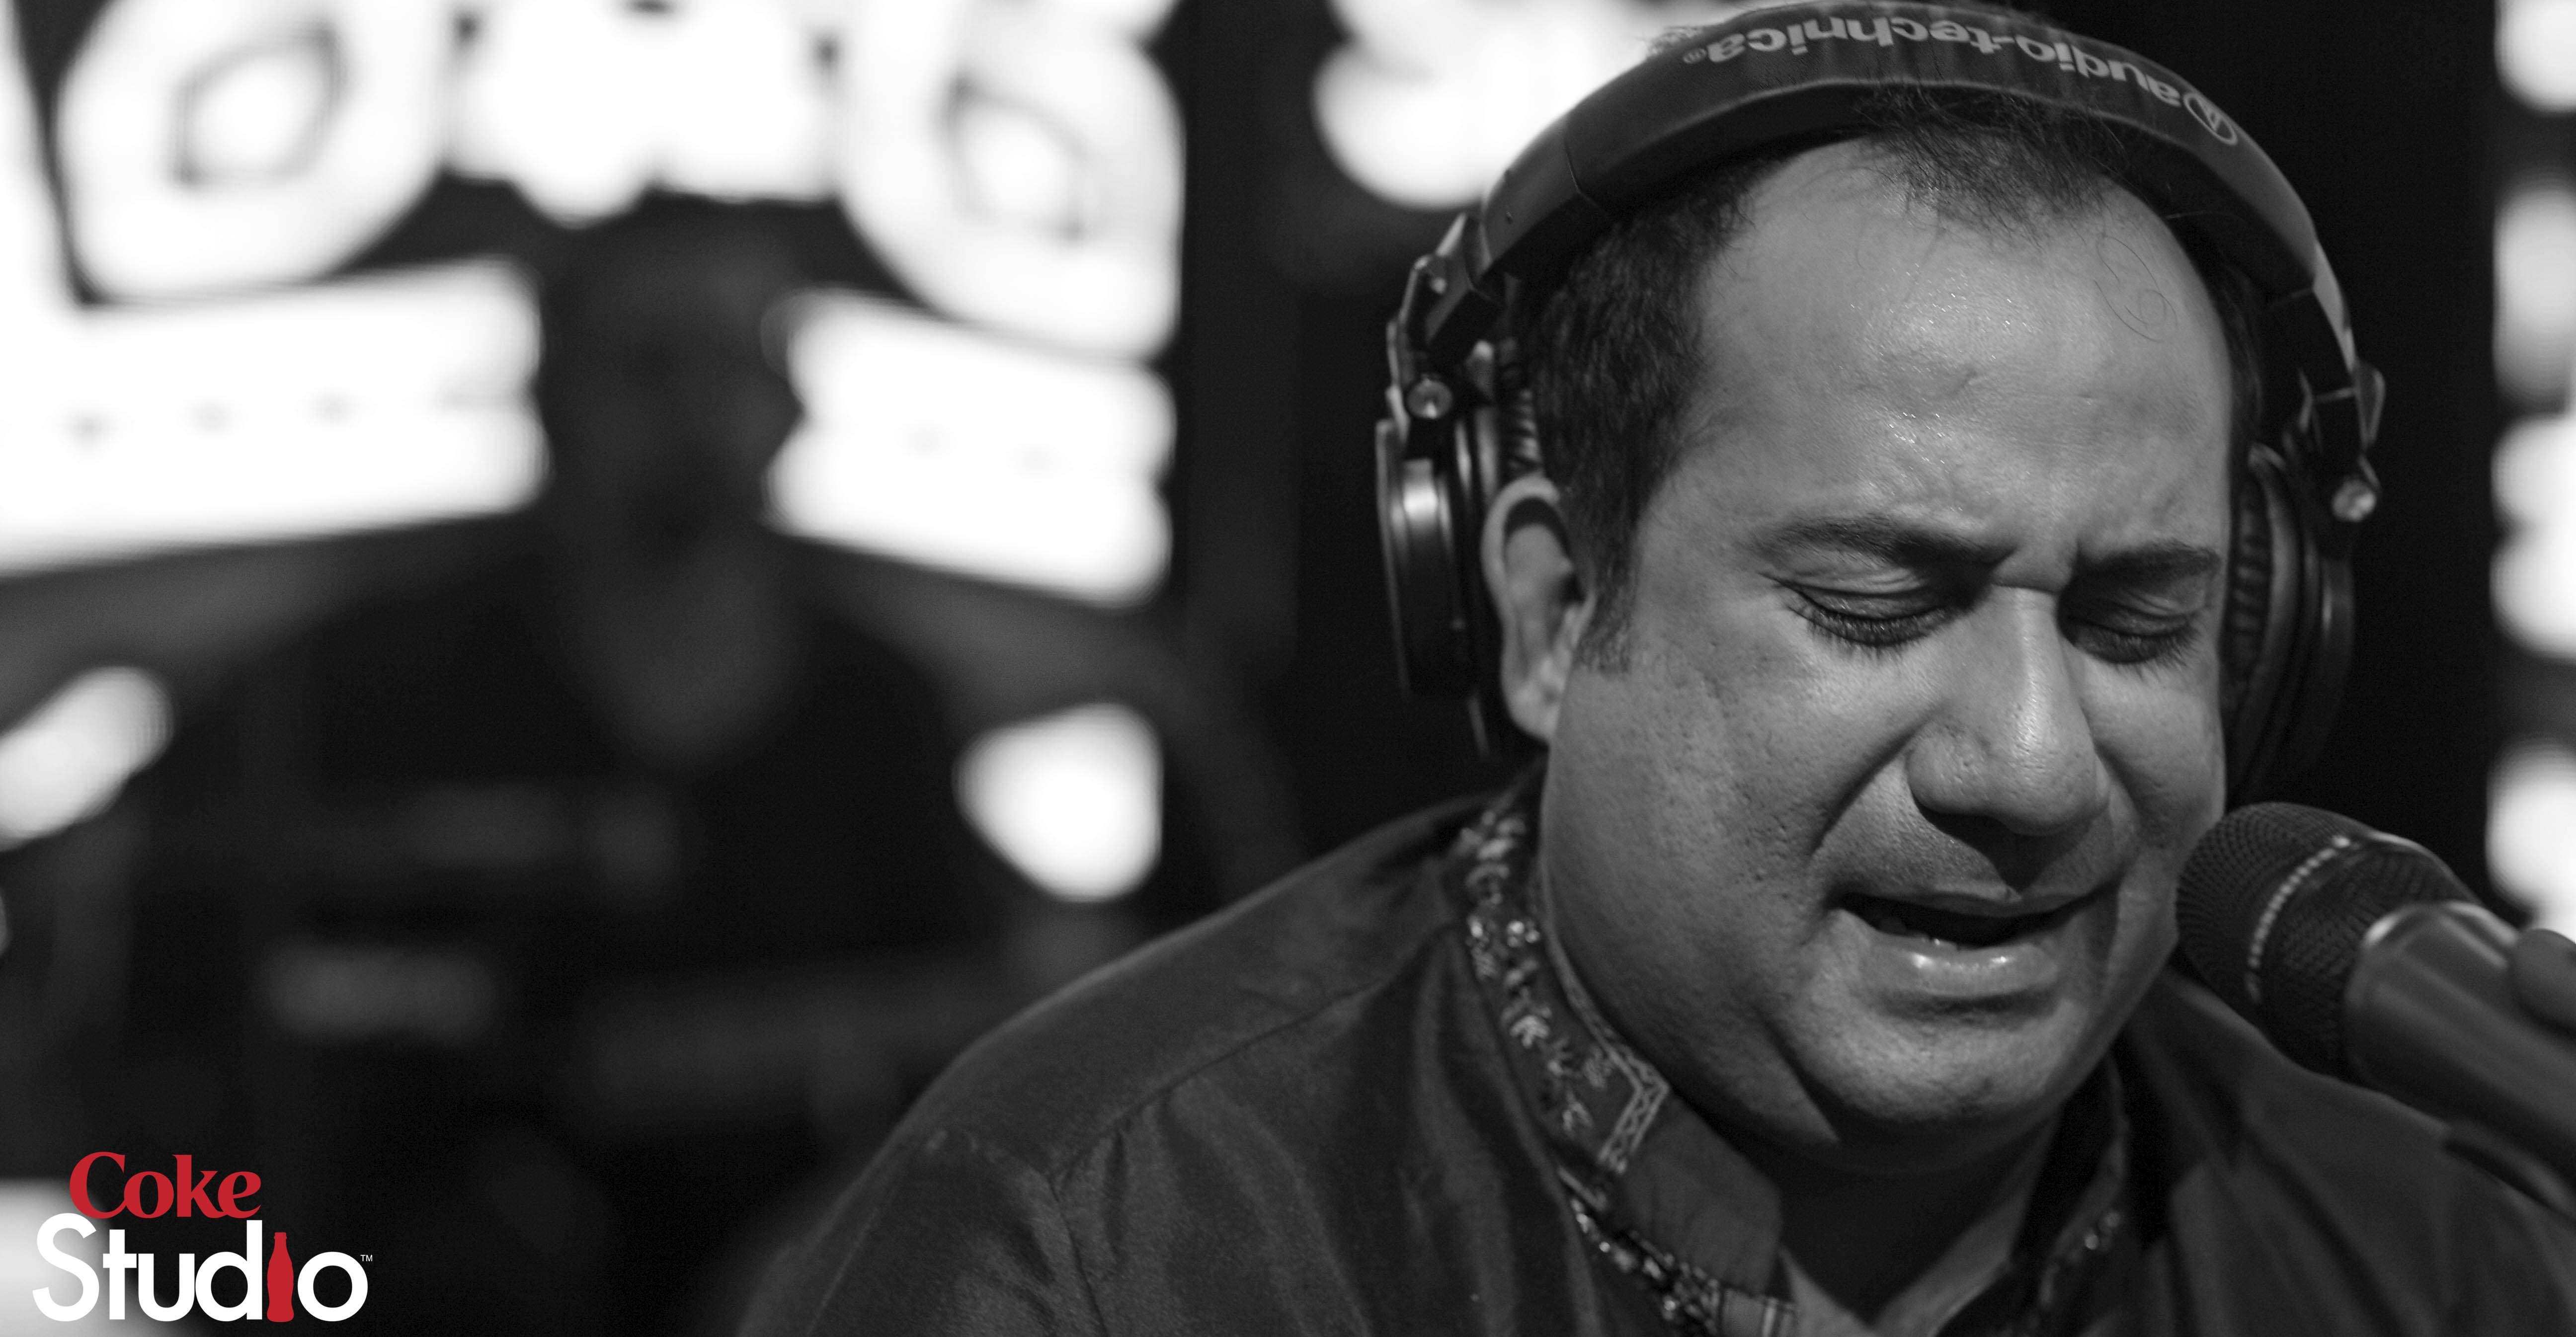 Rahat-Fateh-Ali-Khan-featured-artists-coke-studio-season-7